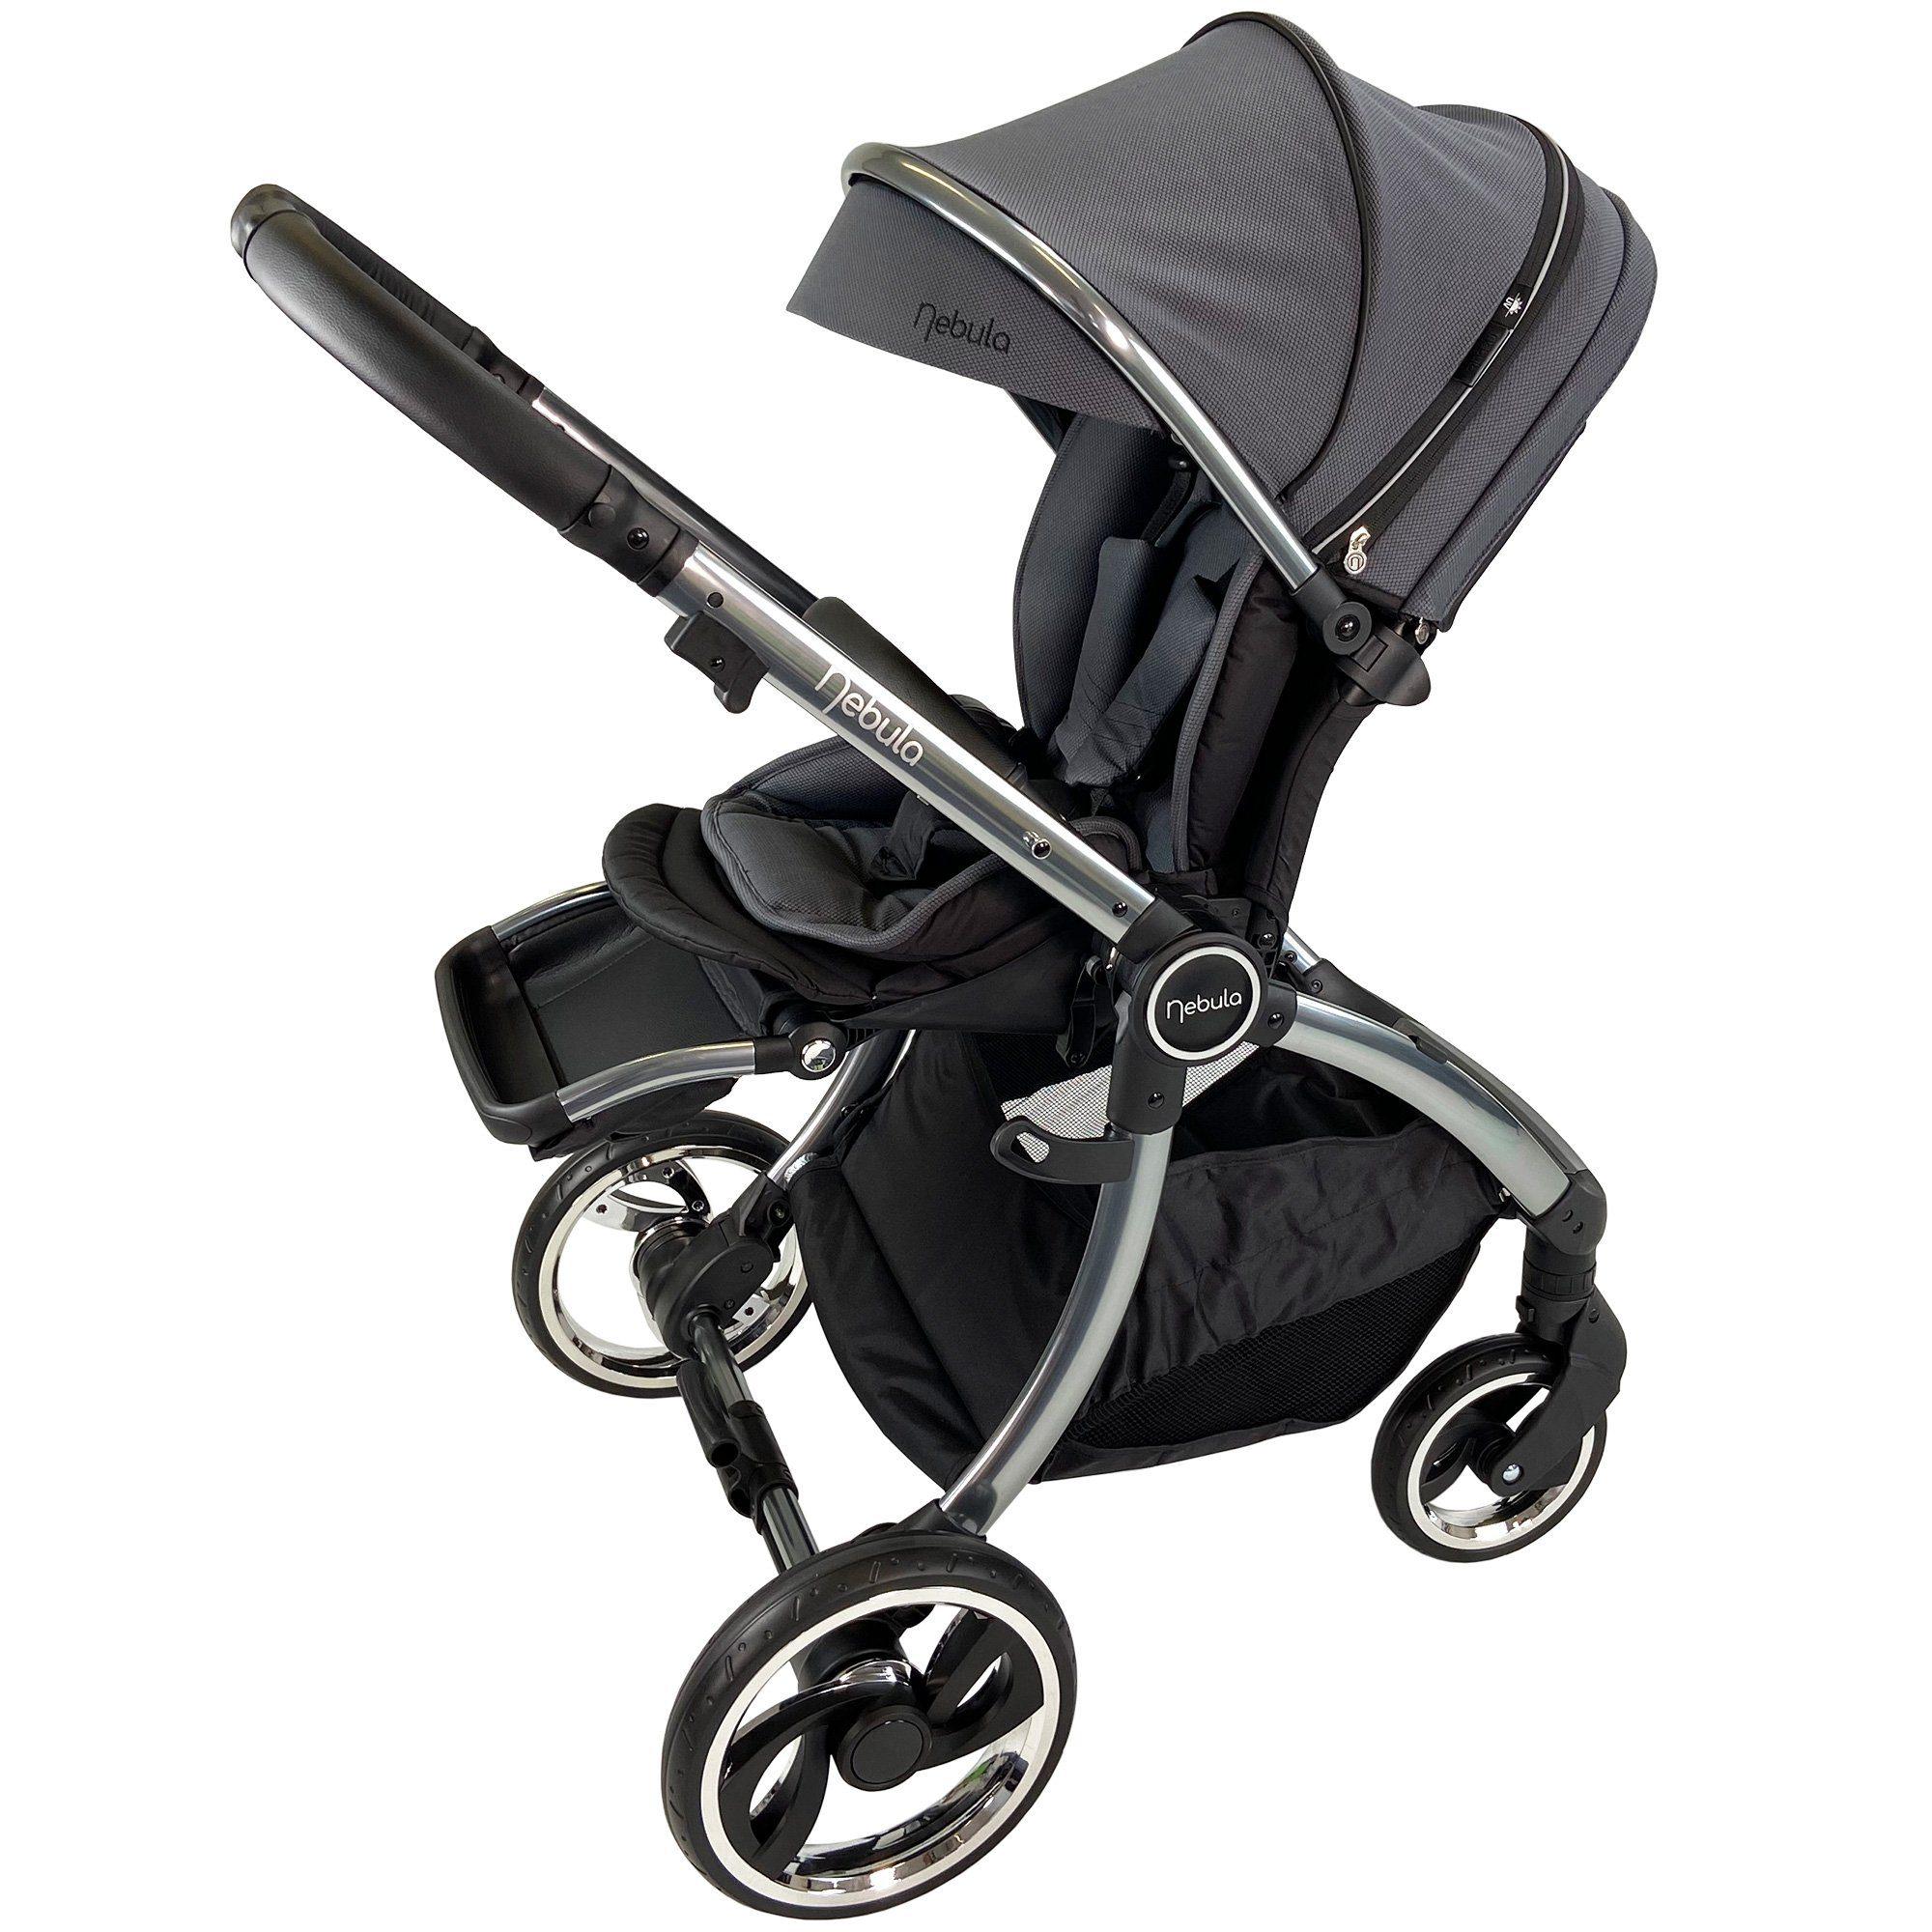 Venture Nebula Metro Grey stroller in parent facing mode